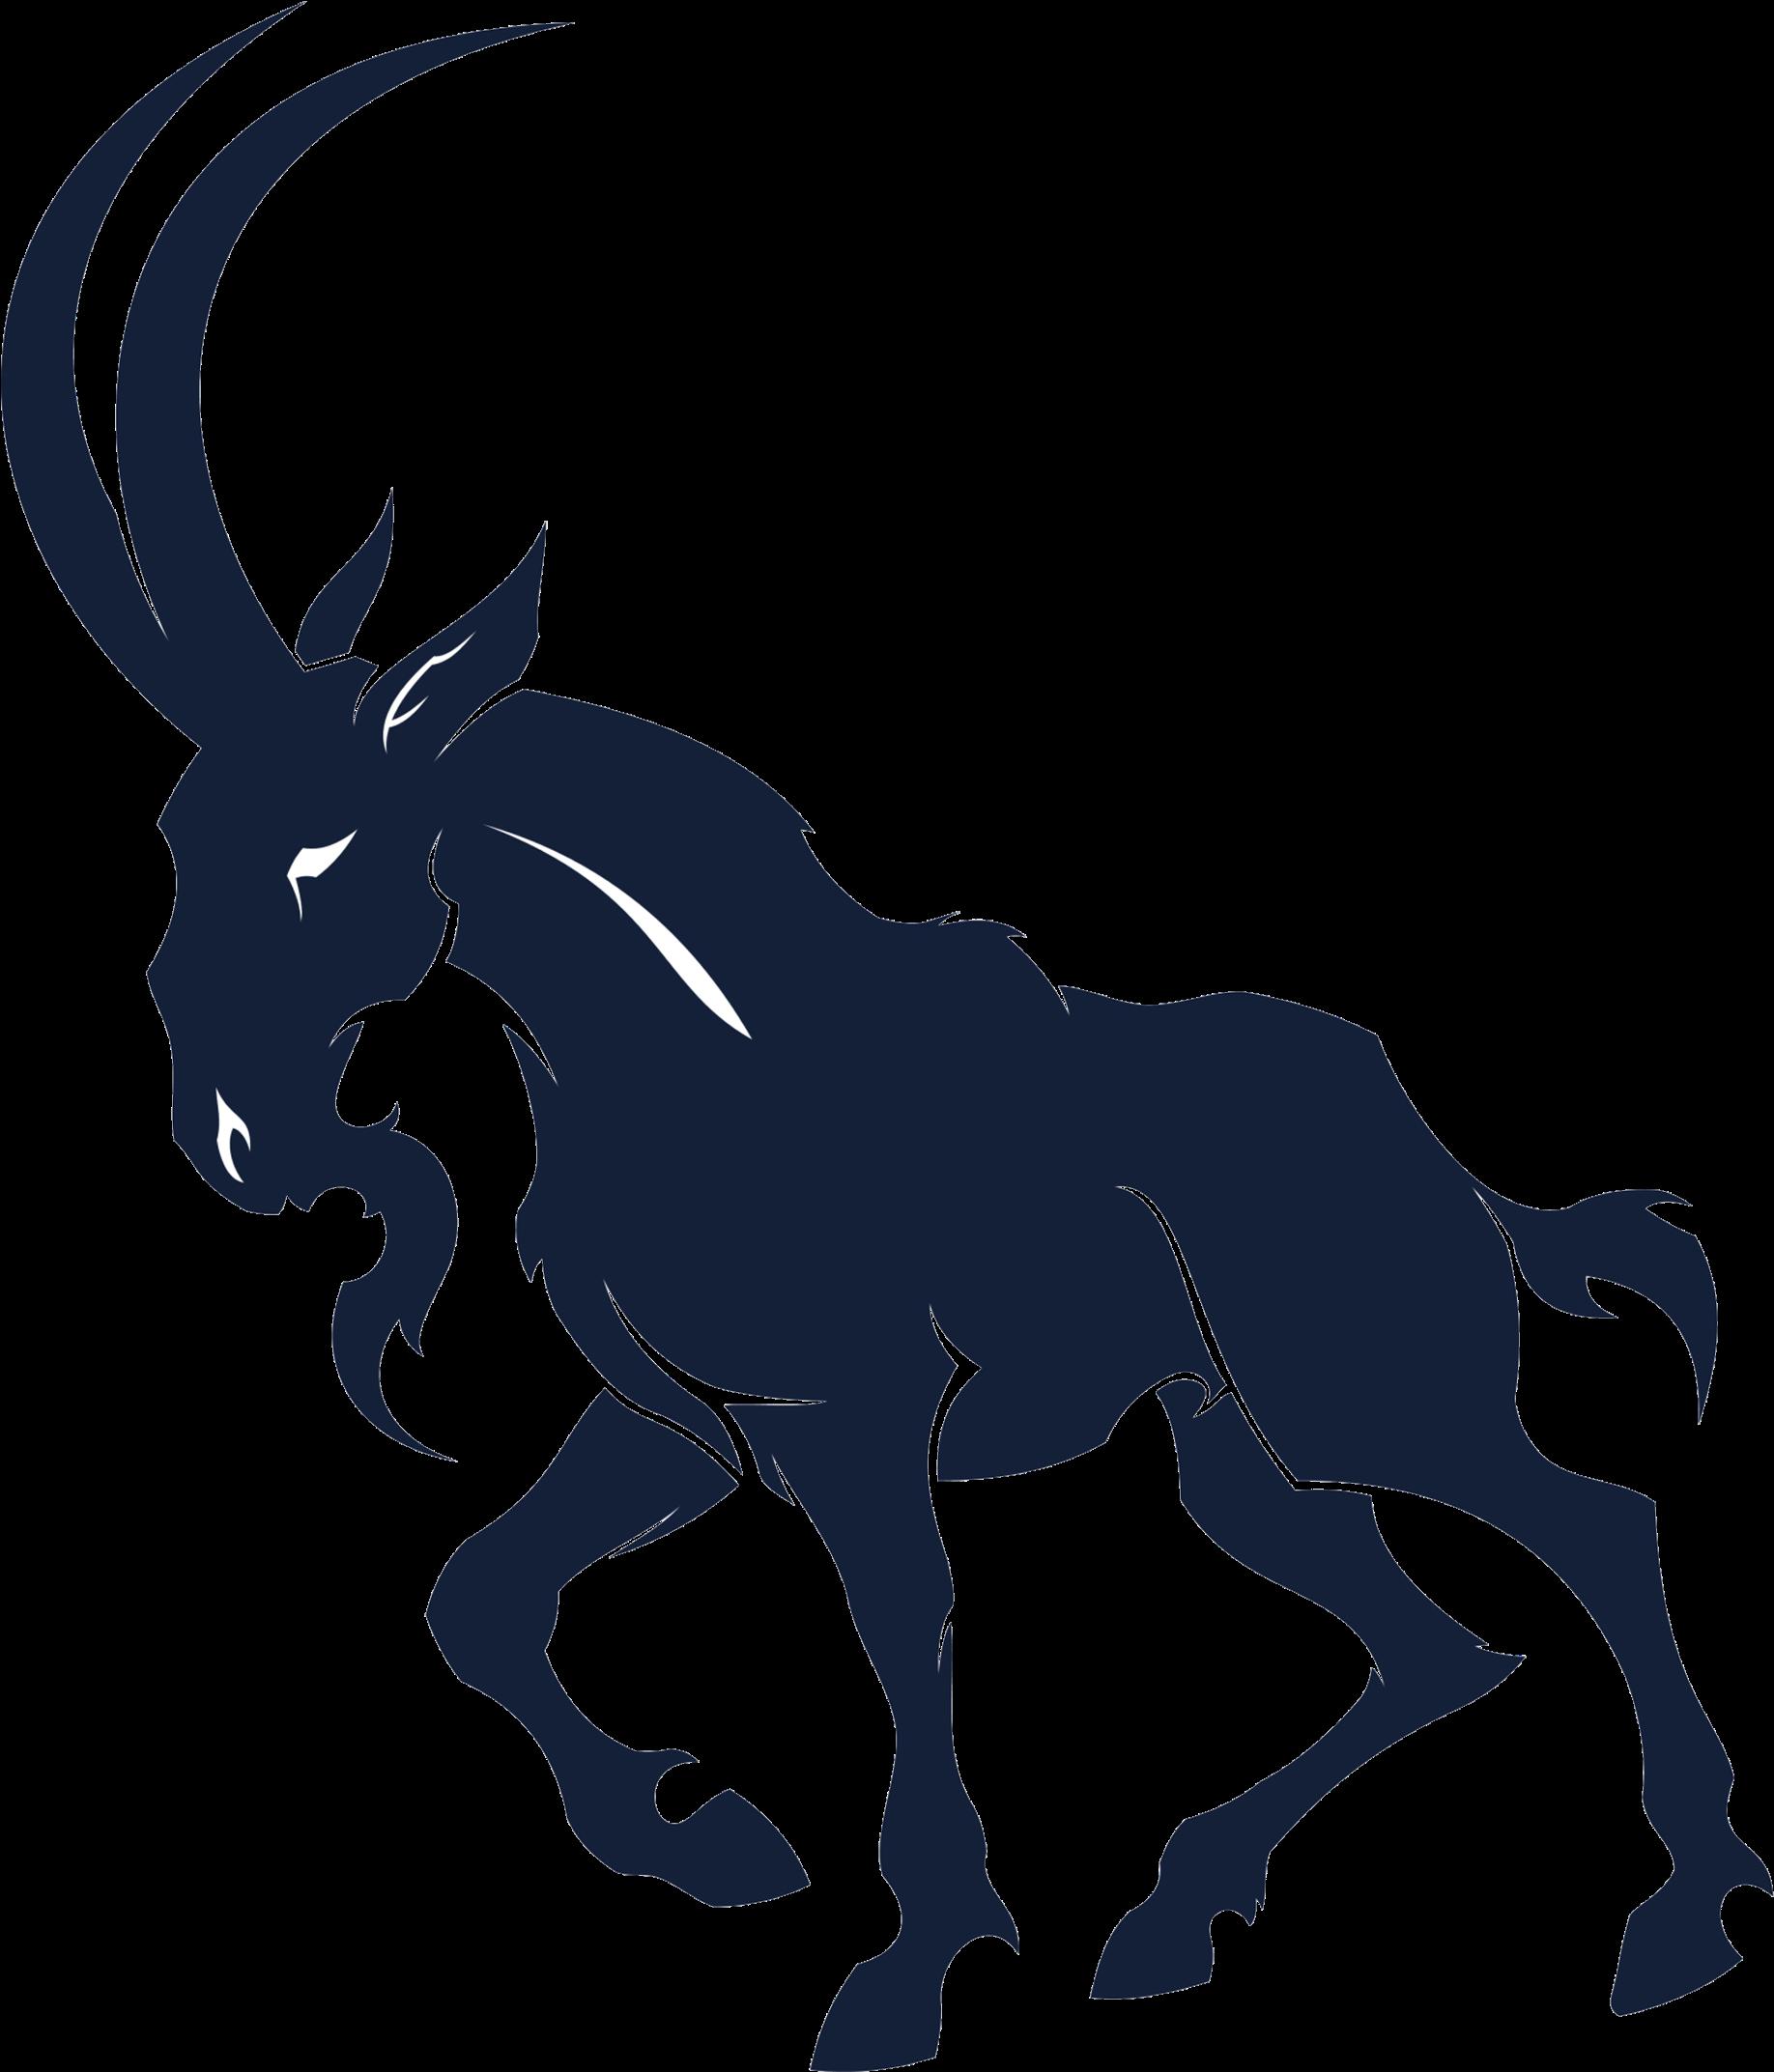 Nigerian Dwarf Goat Sheep Alpine Ibex Antelope - Goat Tattoo - (2440x2381)  Png Clipart Download